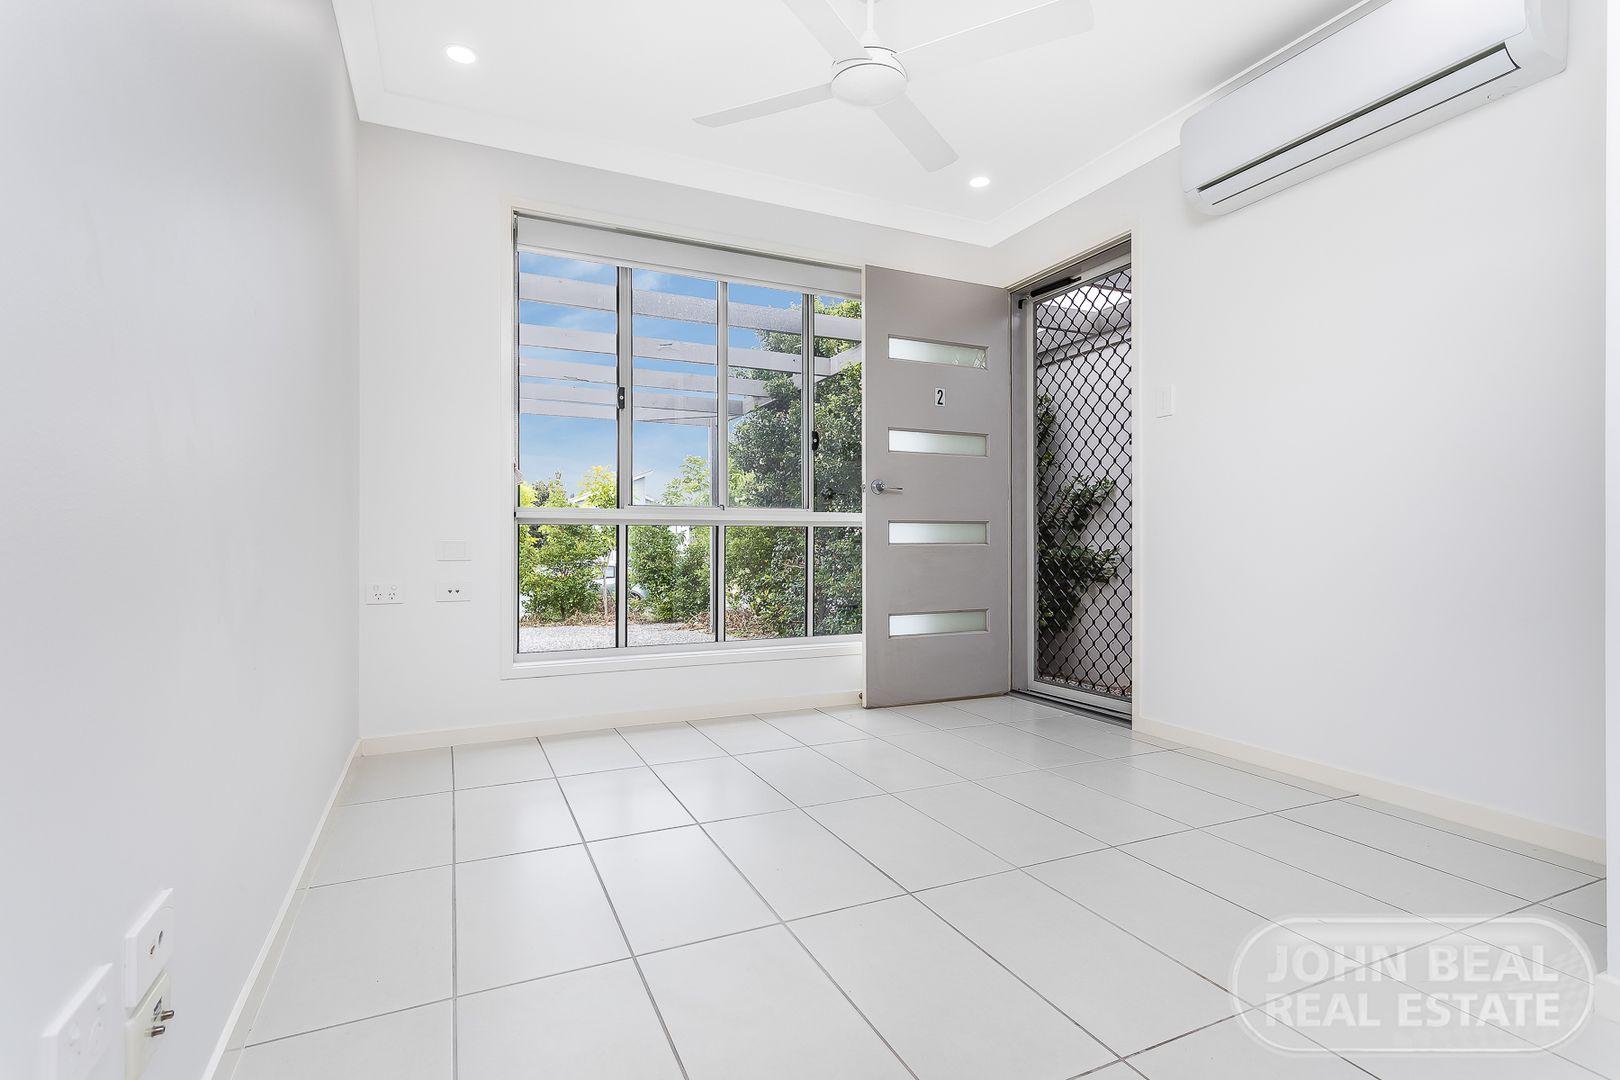 Unit 2/73 Jones St, Rothwell QLD 4022, Image 0